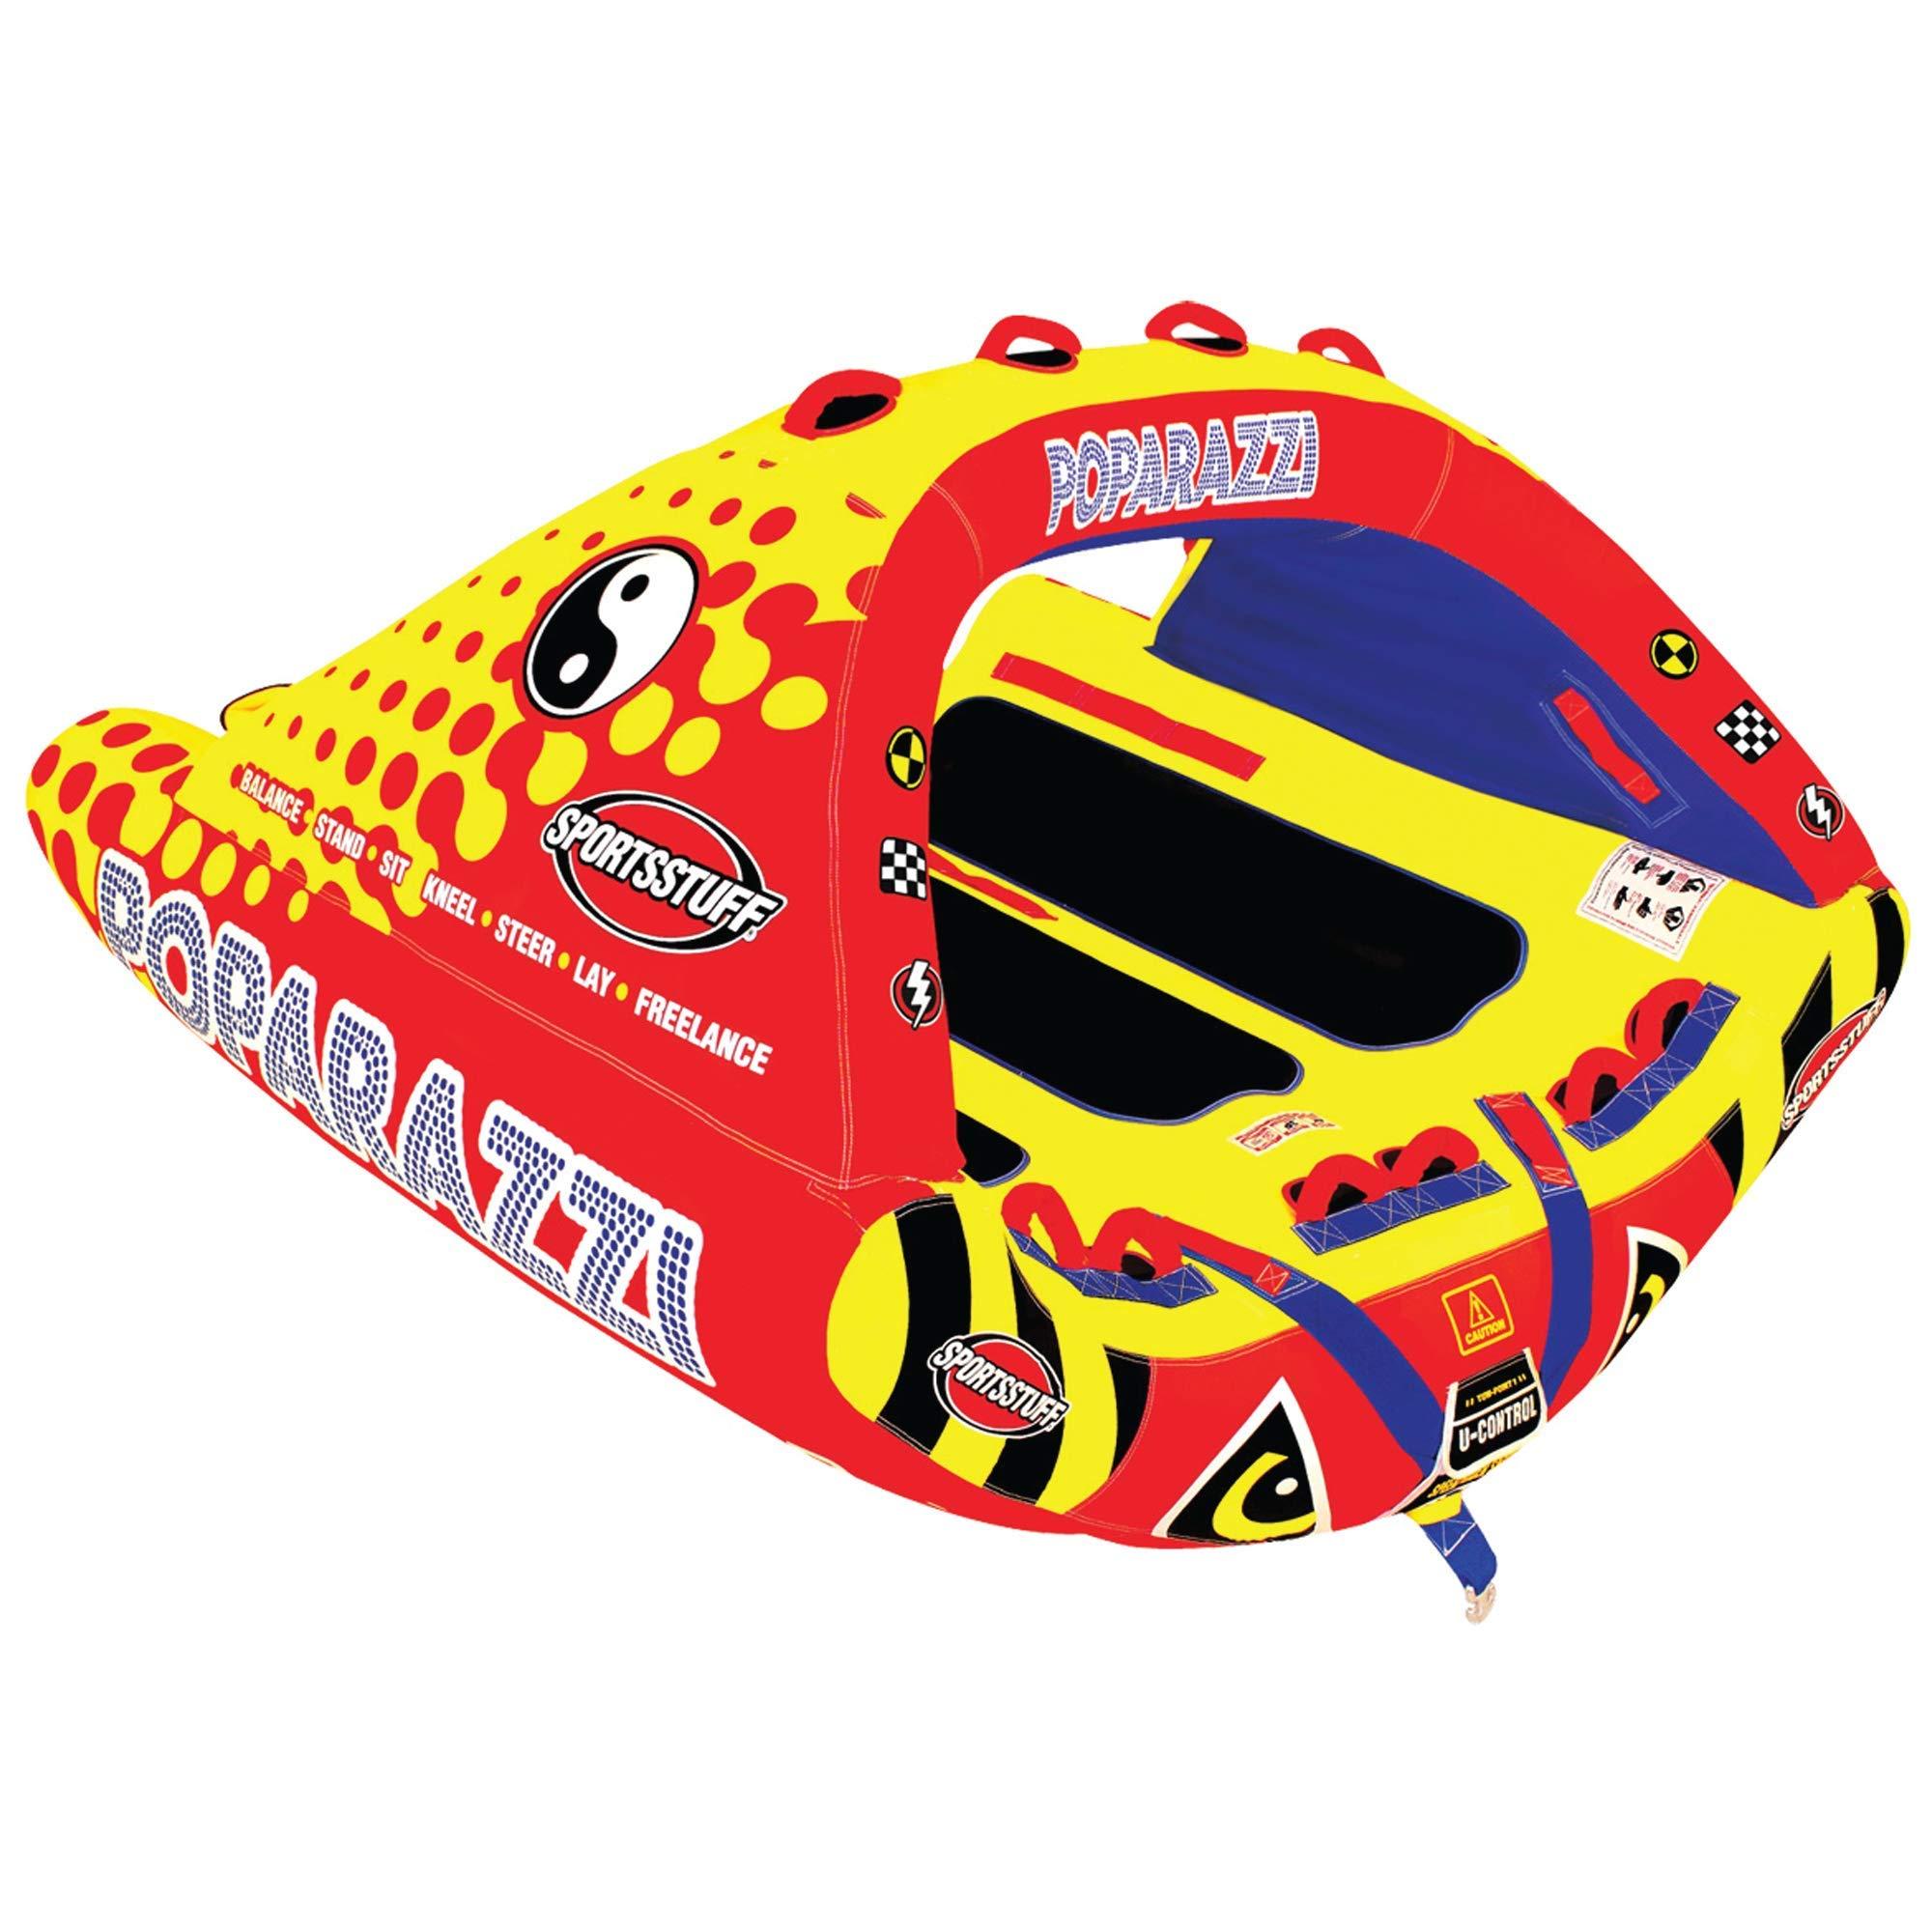 Sportsstuff Poparazzi | 1-3 Rider Towable Tube for Boating by SportsStuff